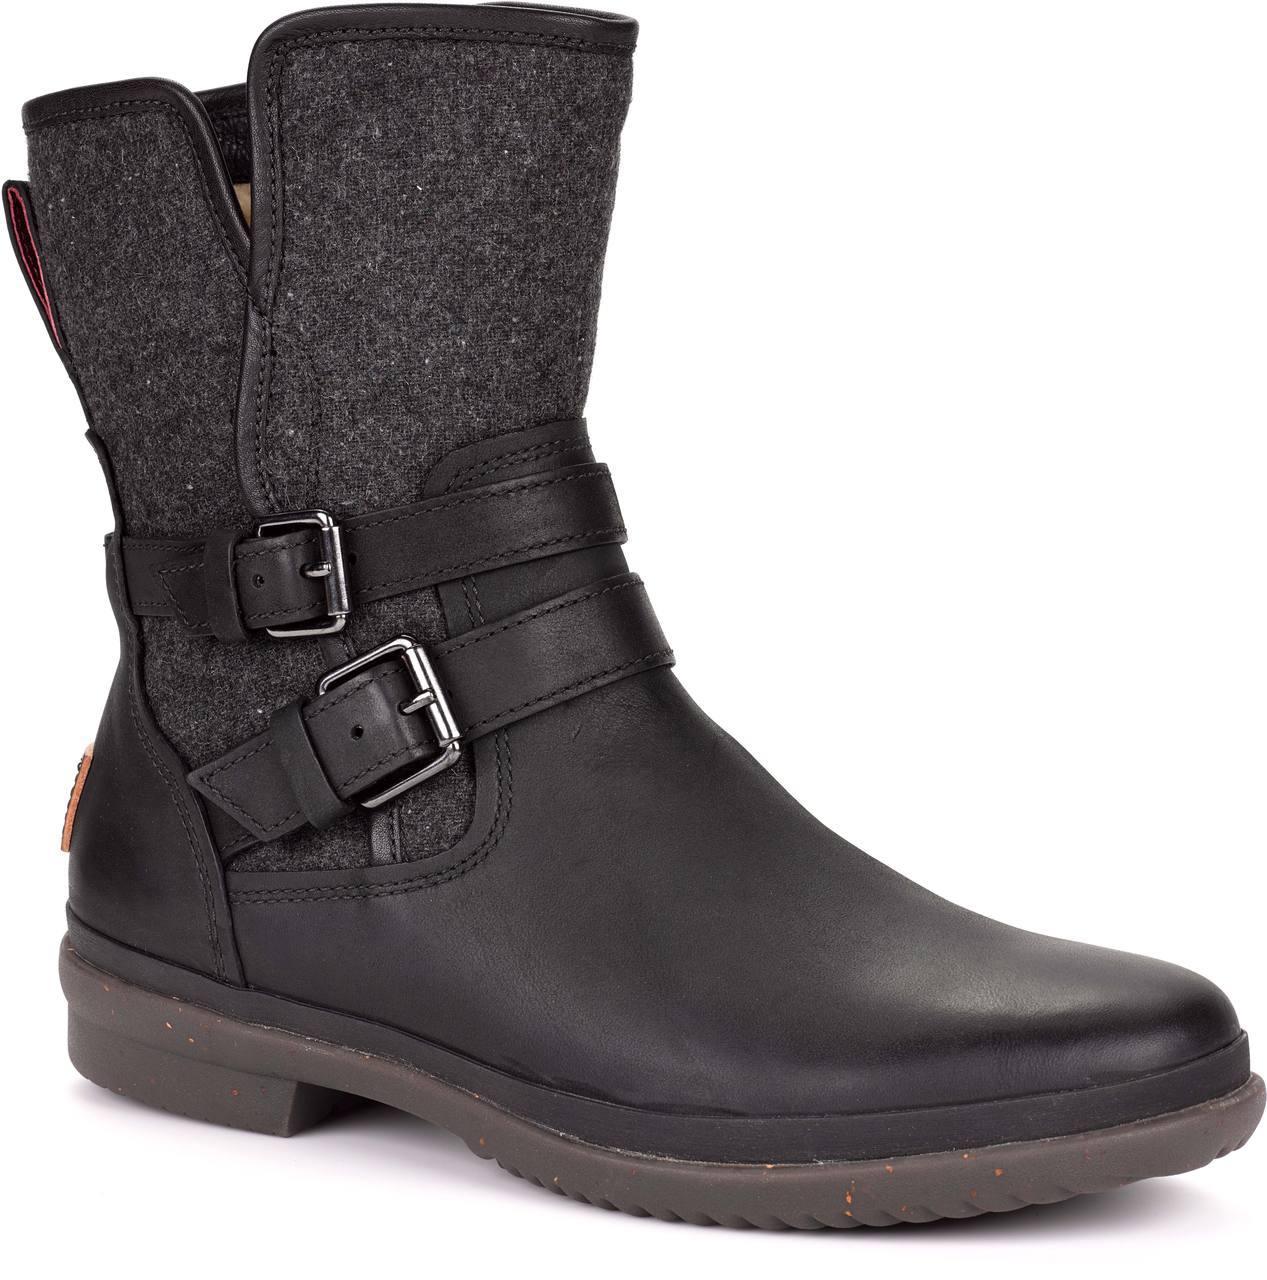 9a1ef6eca2a UGG Rain Boots for Fall - Englin's Fine Footwear